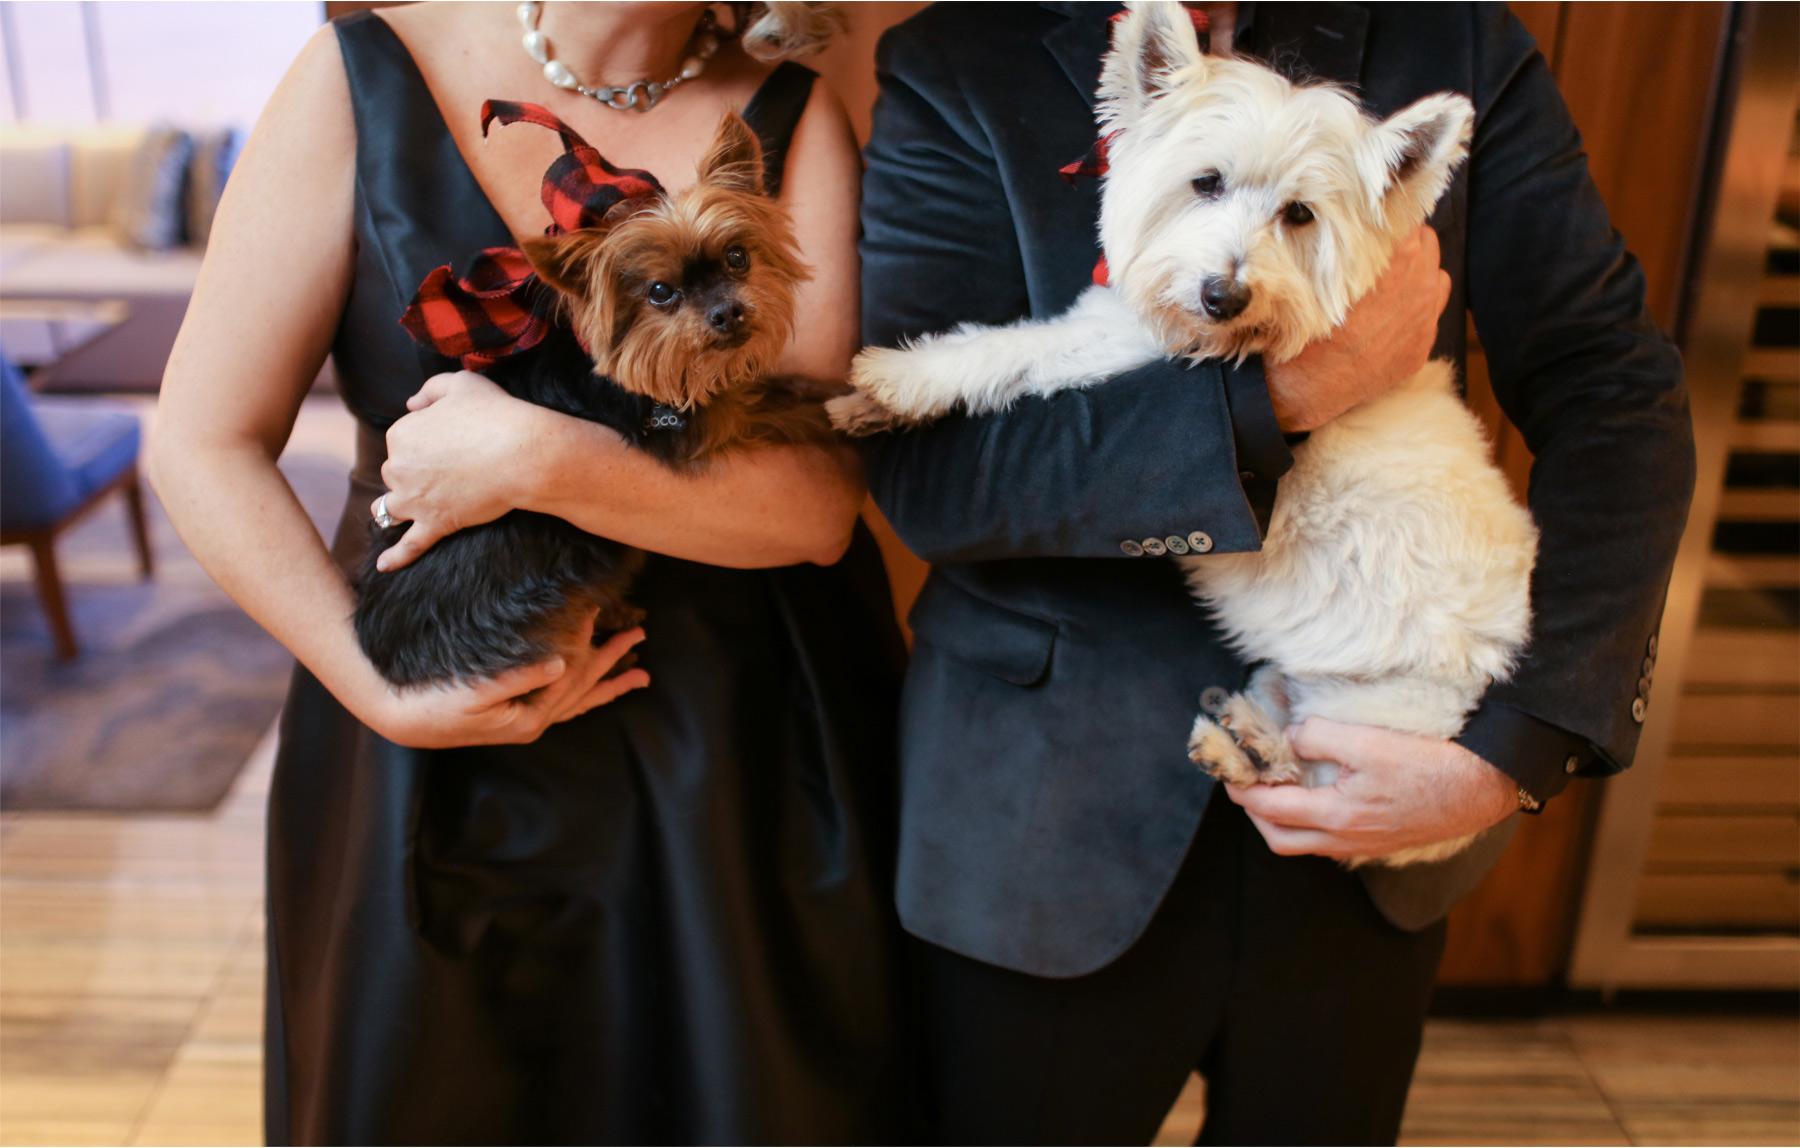 04-Minneapolis-Minnesota-Wedding-Photography-by-Vick-Photography-Loews-Hotel-Dogs-Joan-and-Tim.jpg